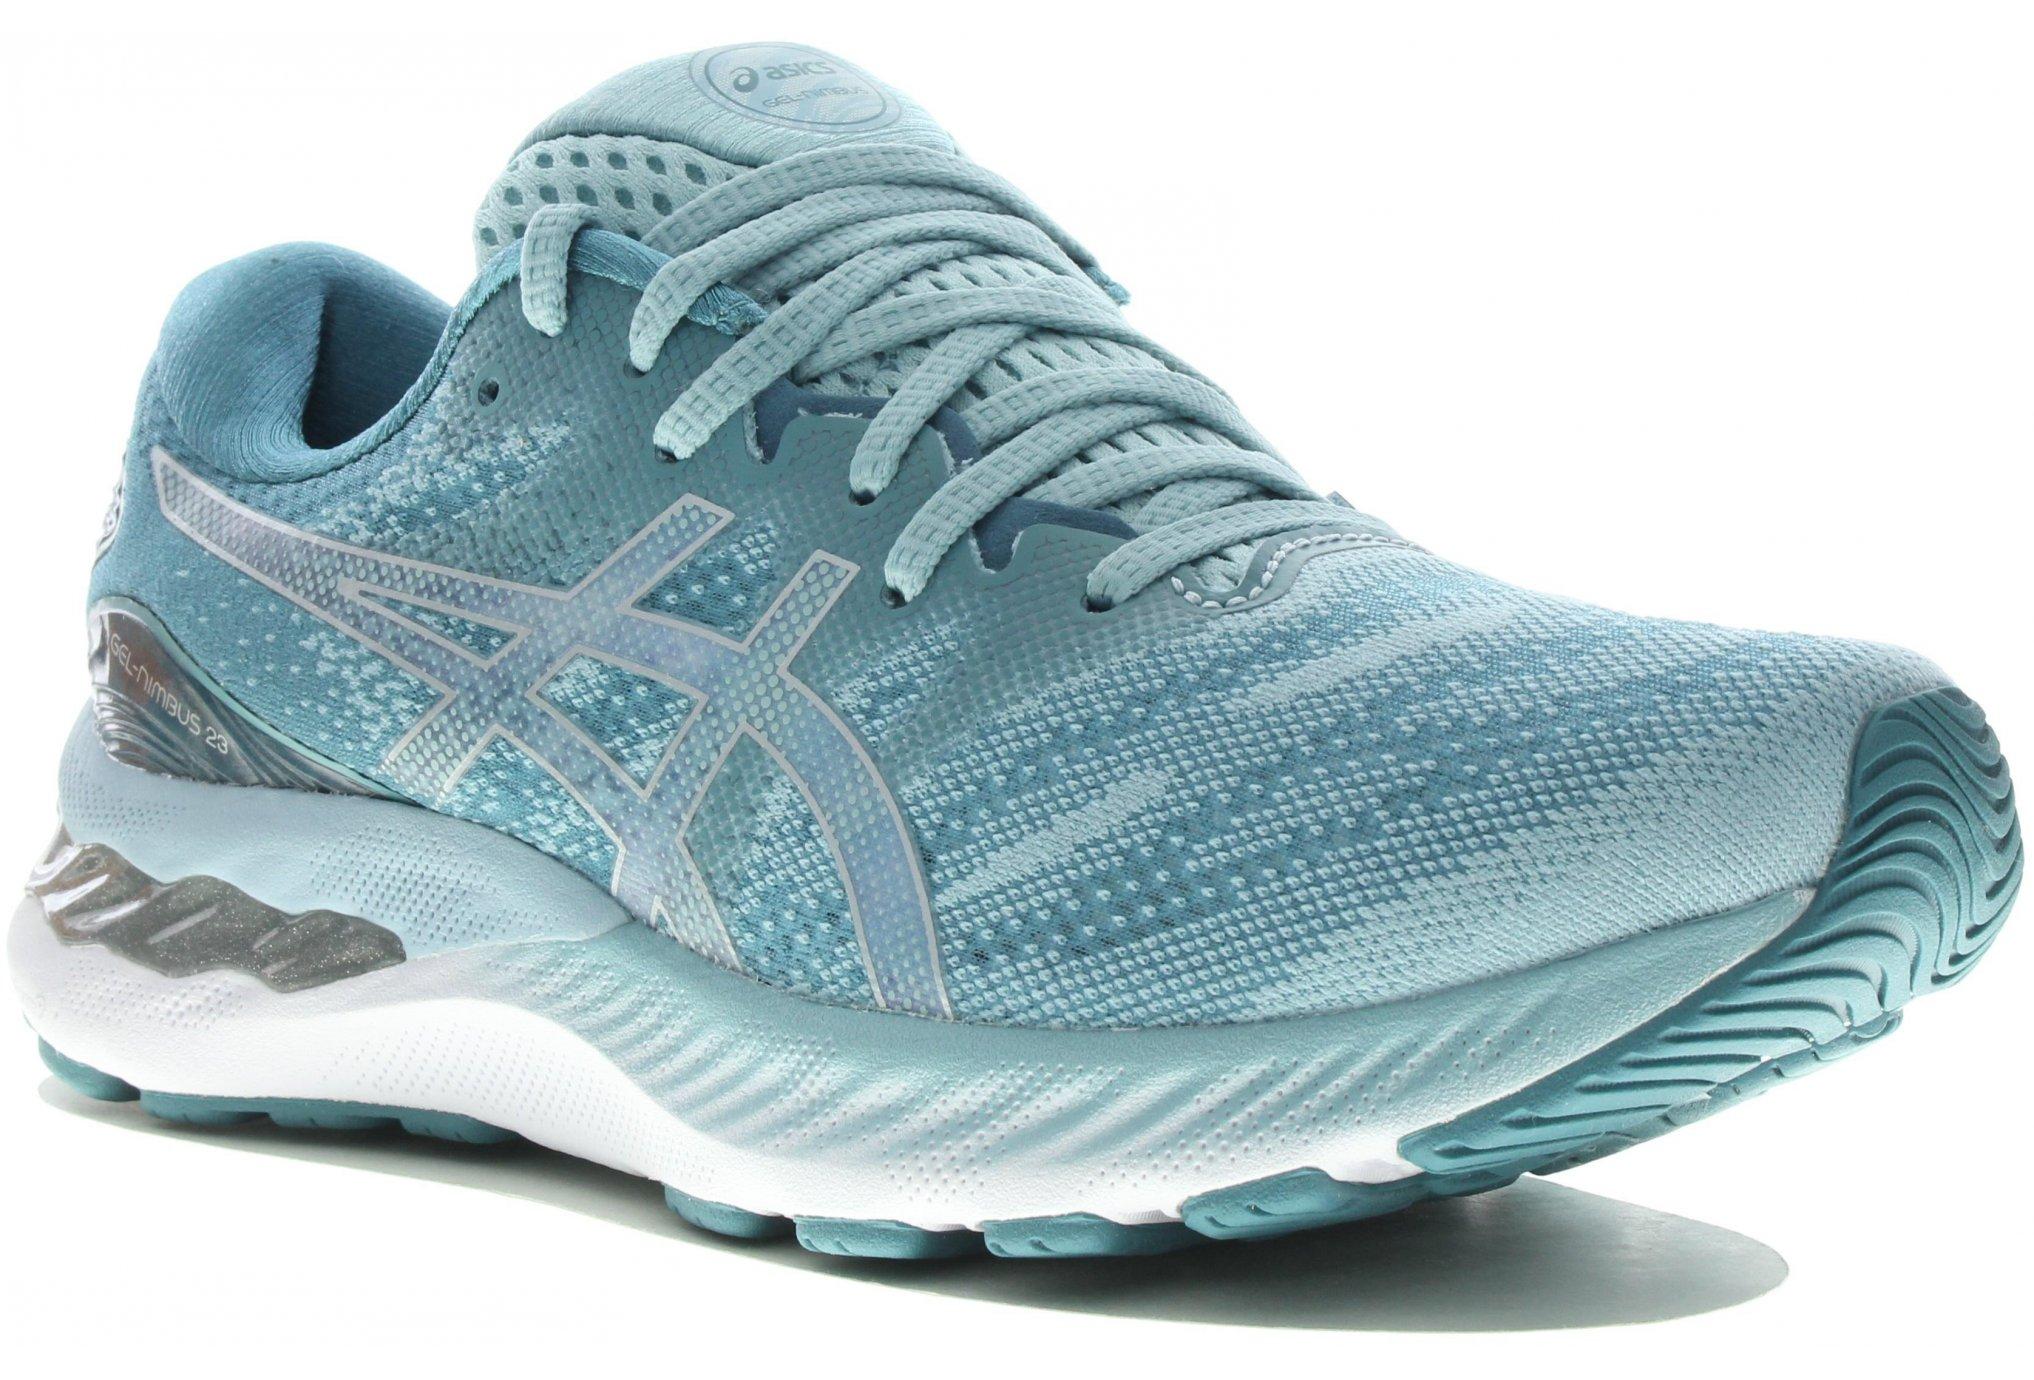 Asics Gel-Nimbus 23 Chaussures running femme